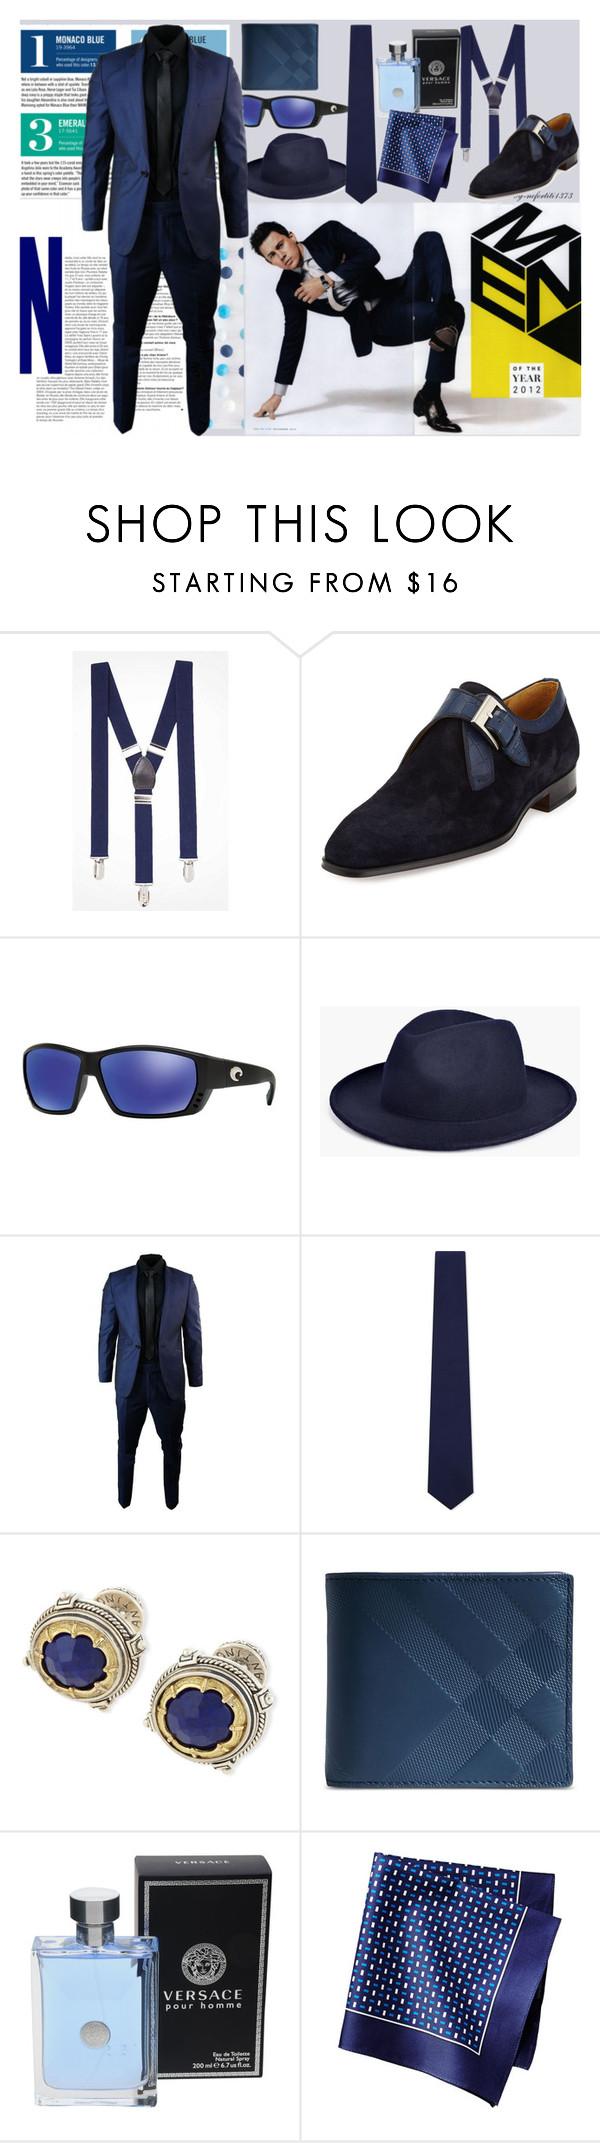 """The Night Sky Impressionist Blue!"" by nefertiti1373 on Polyvore featuring Express, Garance Doré, Magnanni, Costa, BoohooMAN, ETON, Konstantino, Burberry, Versace and men's fashion"